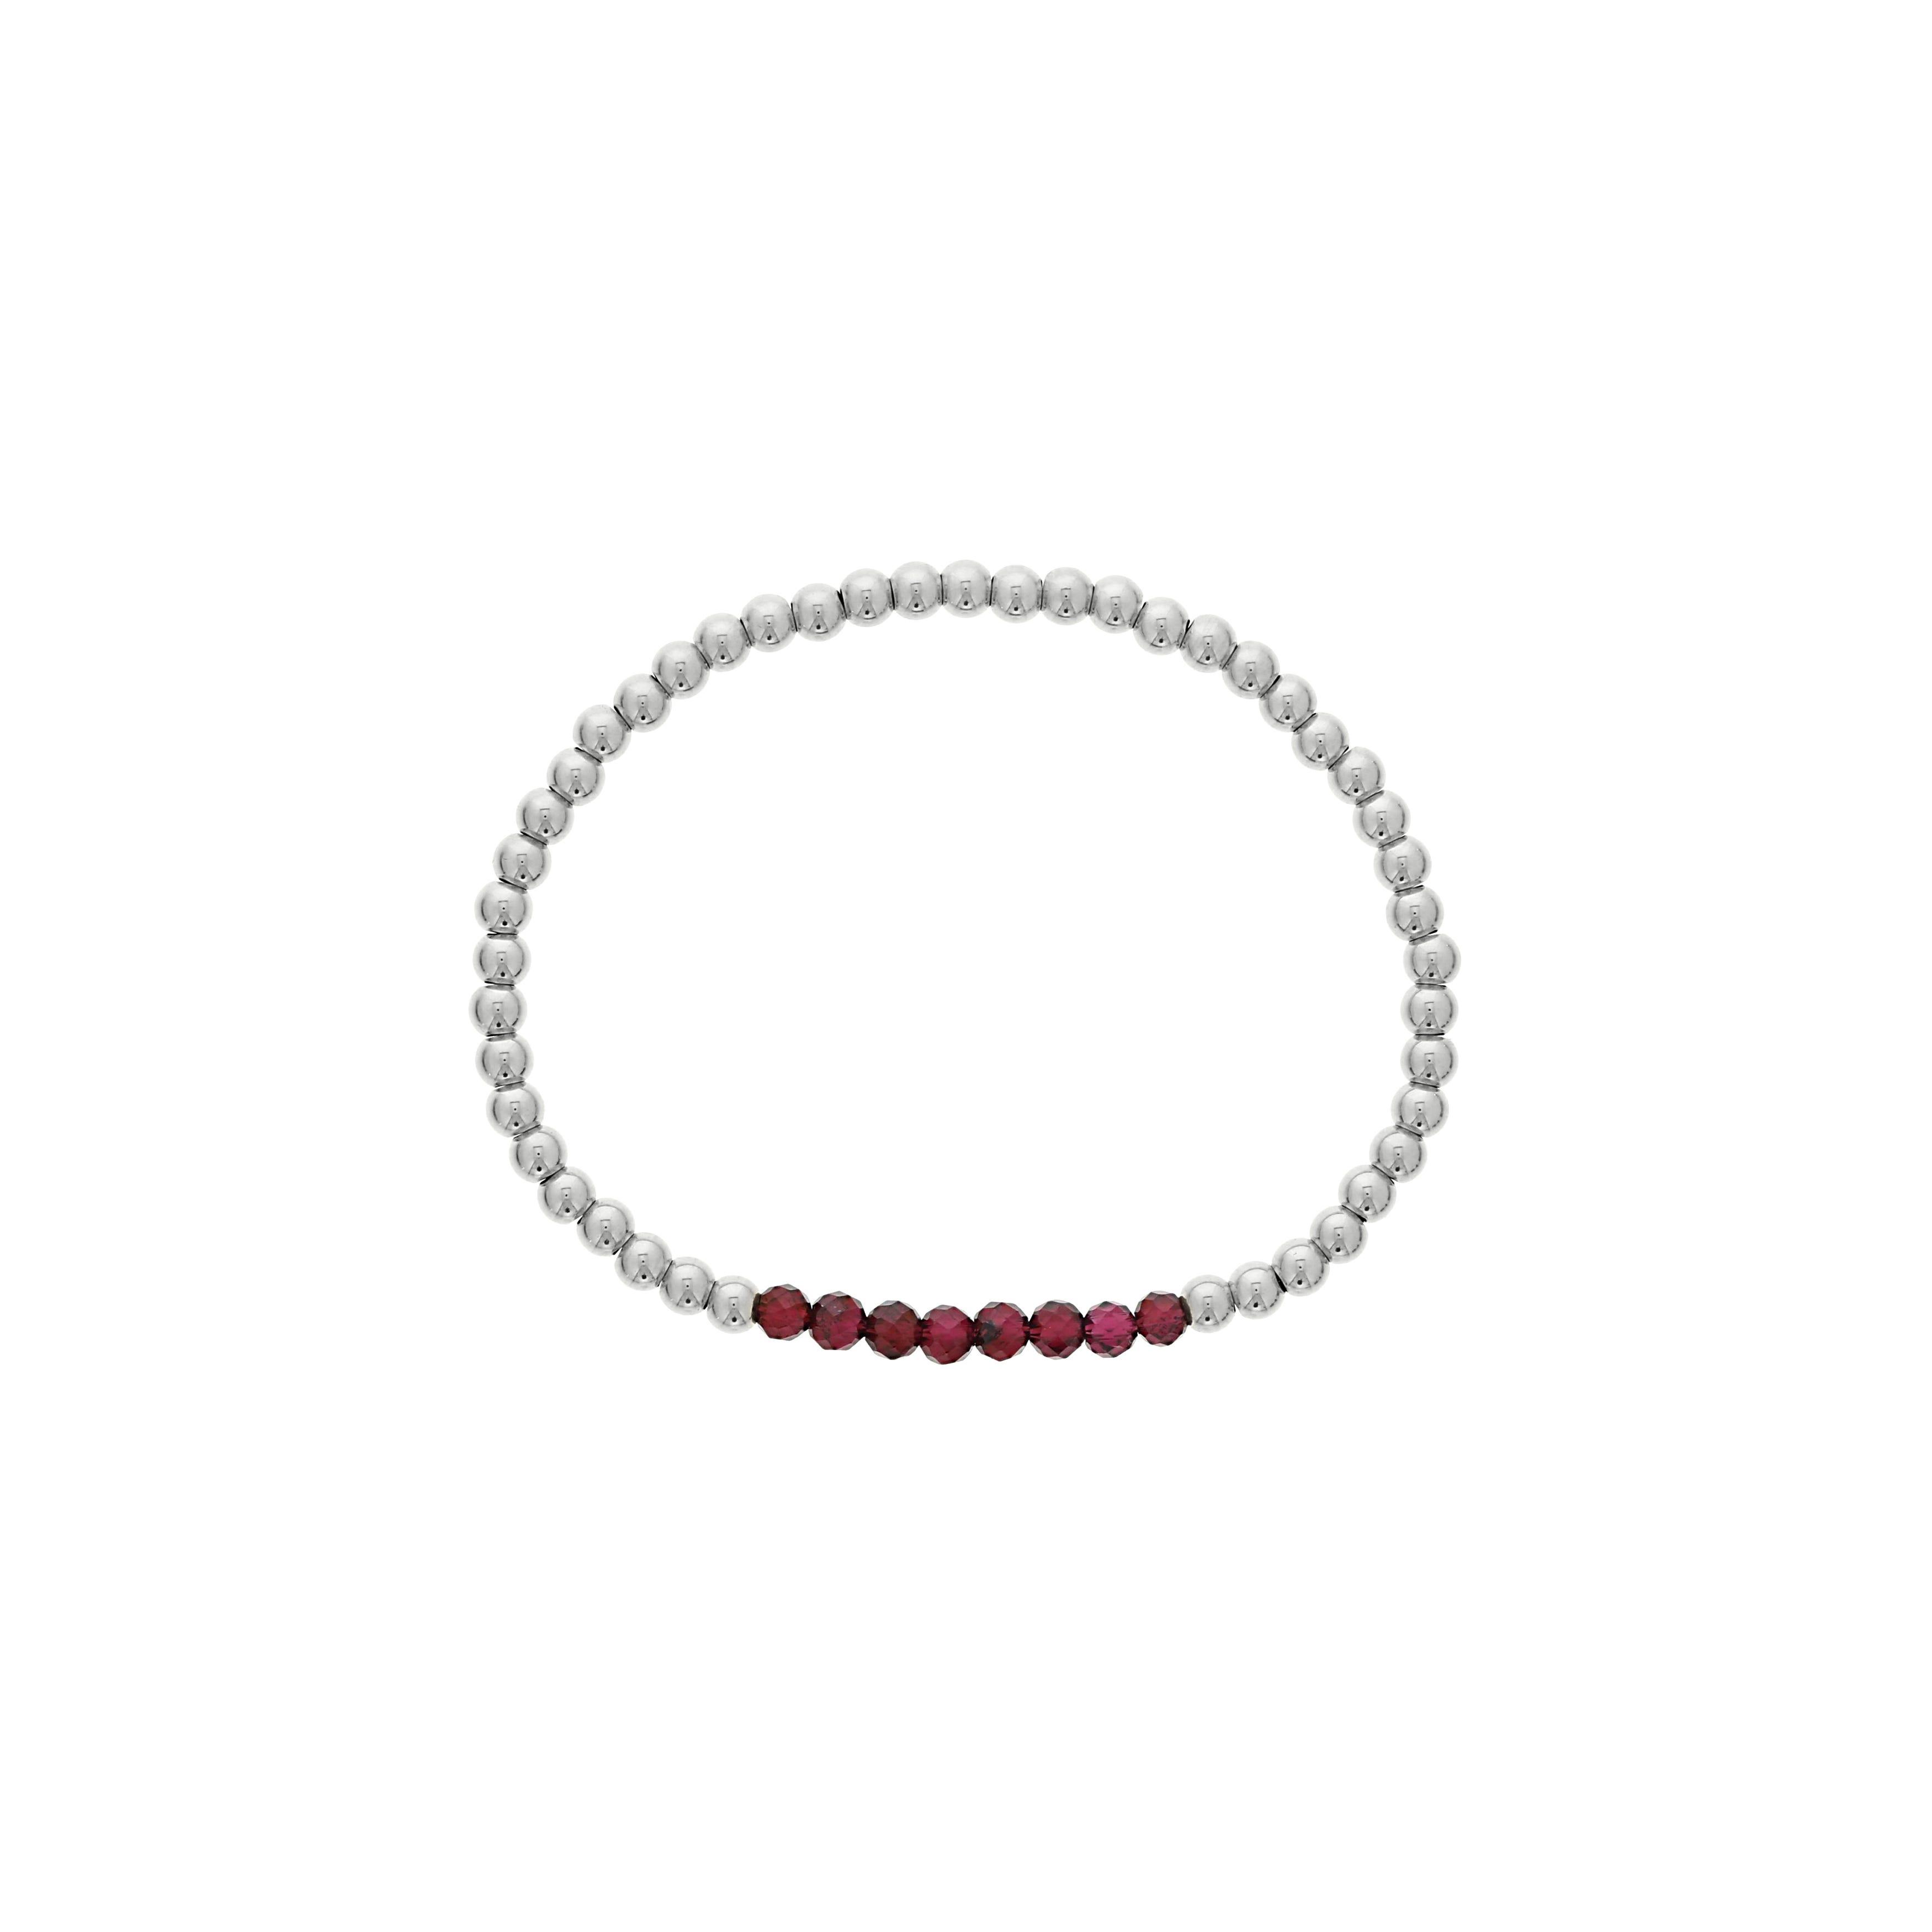 Garnet Birthstone Beaded Bracelet in Sterling Silver